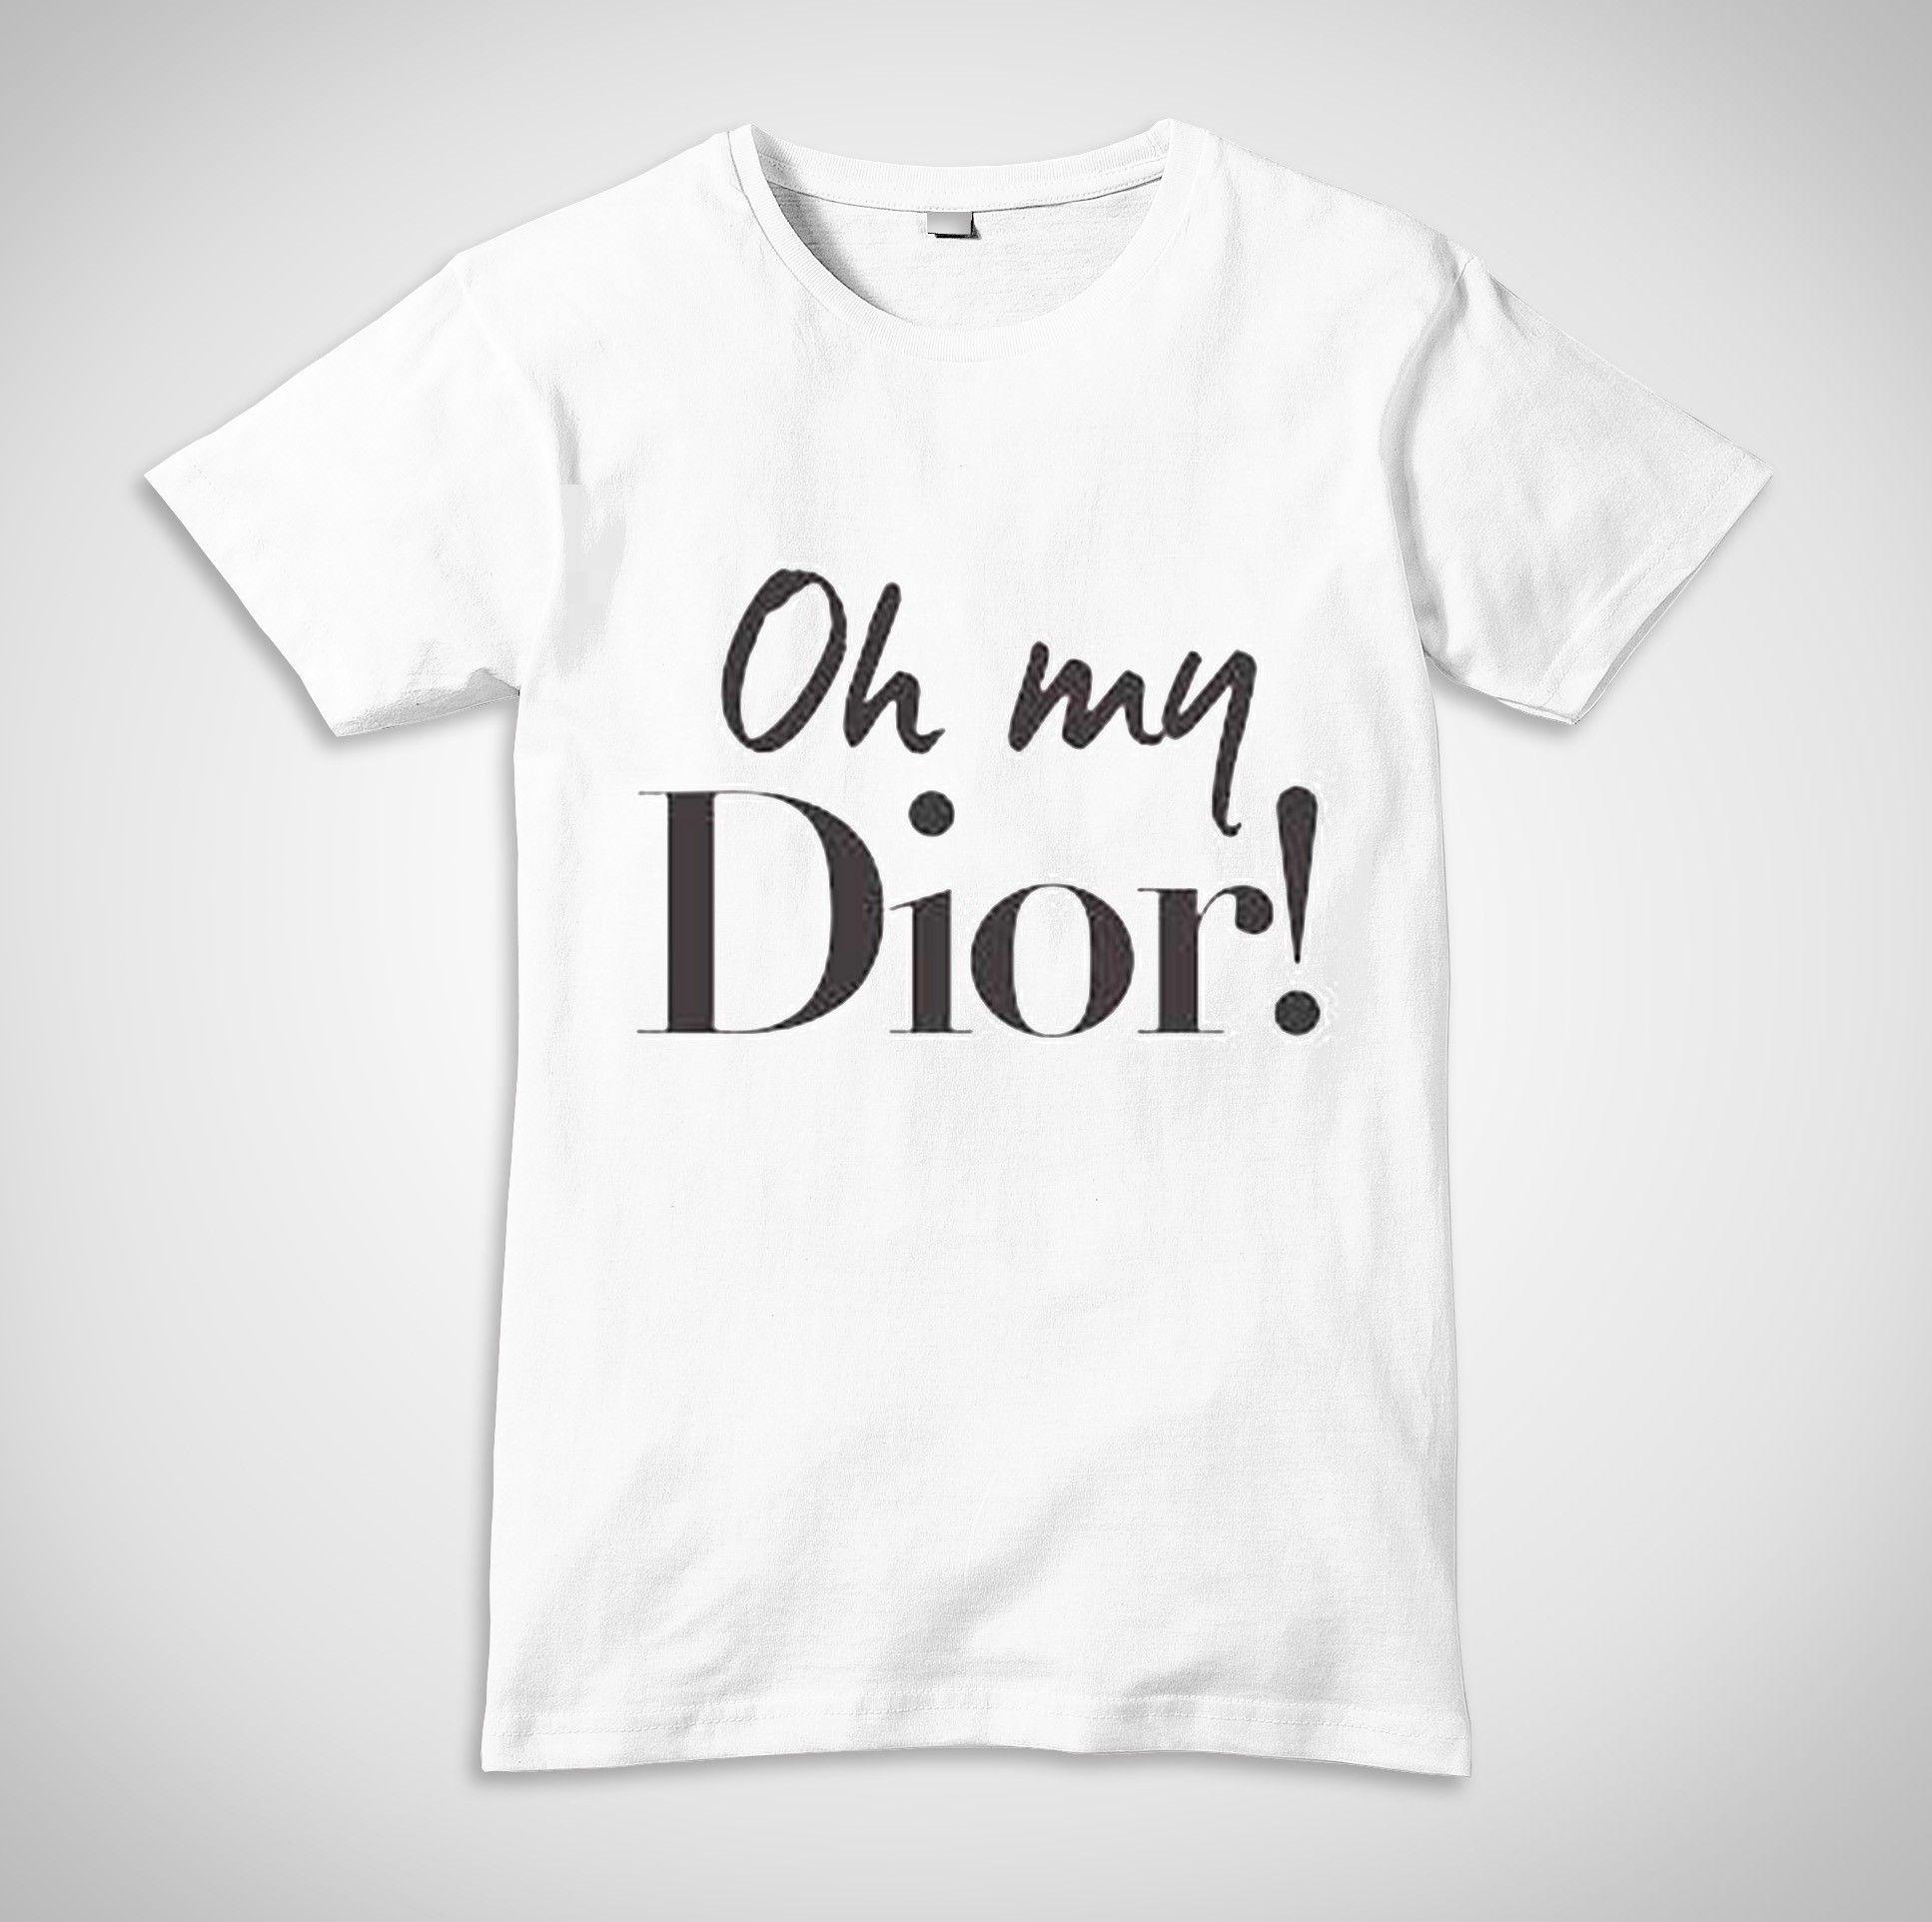 Giraffe Geometric Girls Youth Graphic T Shirt Design By Humans